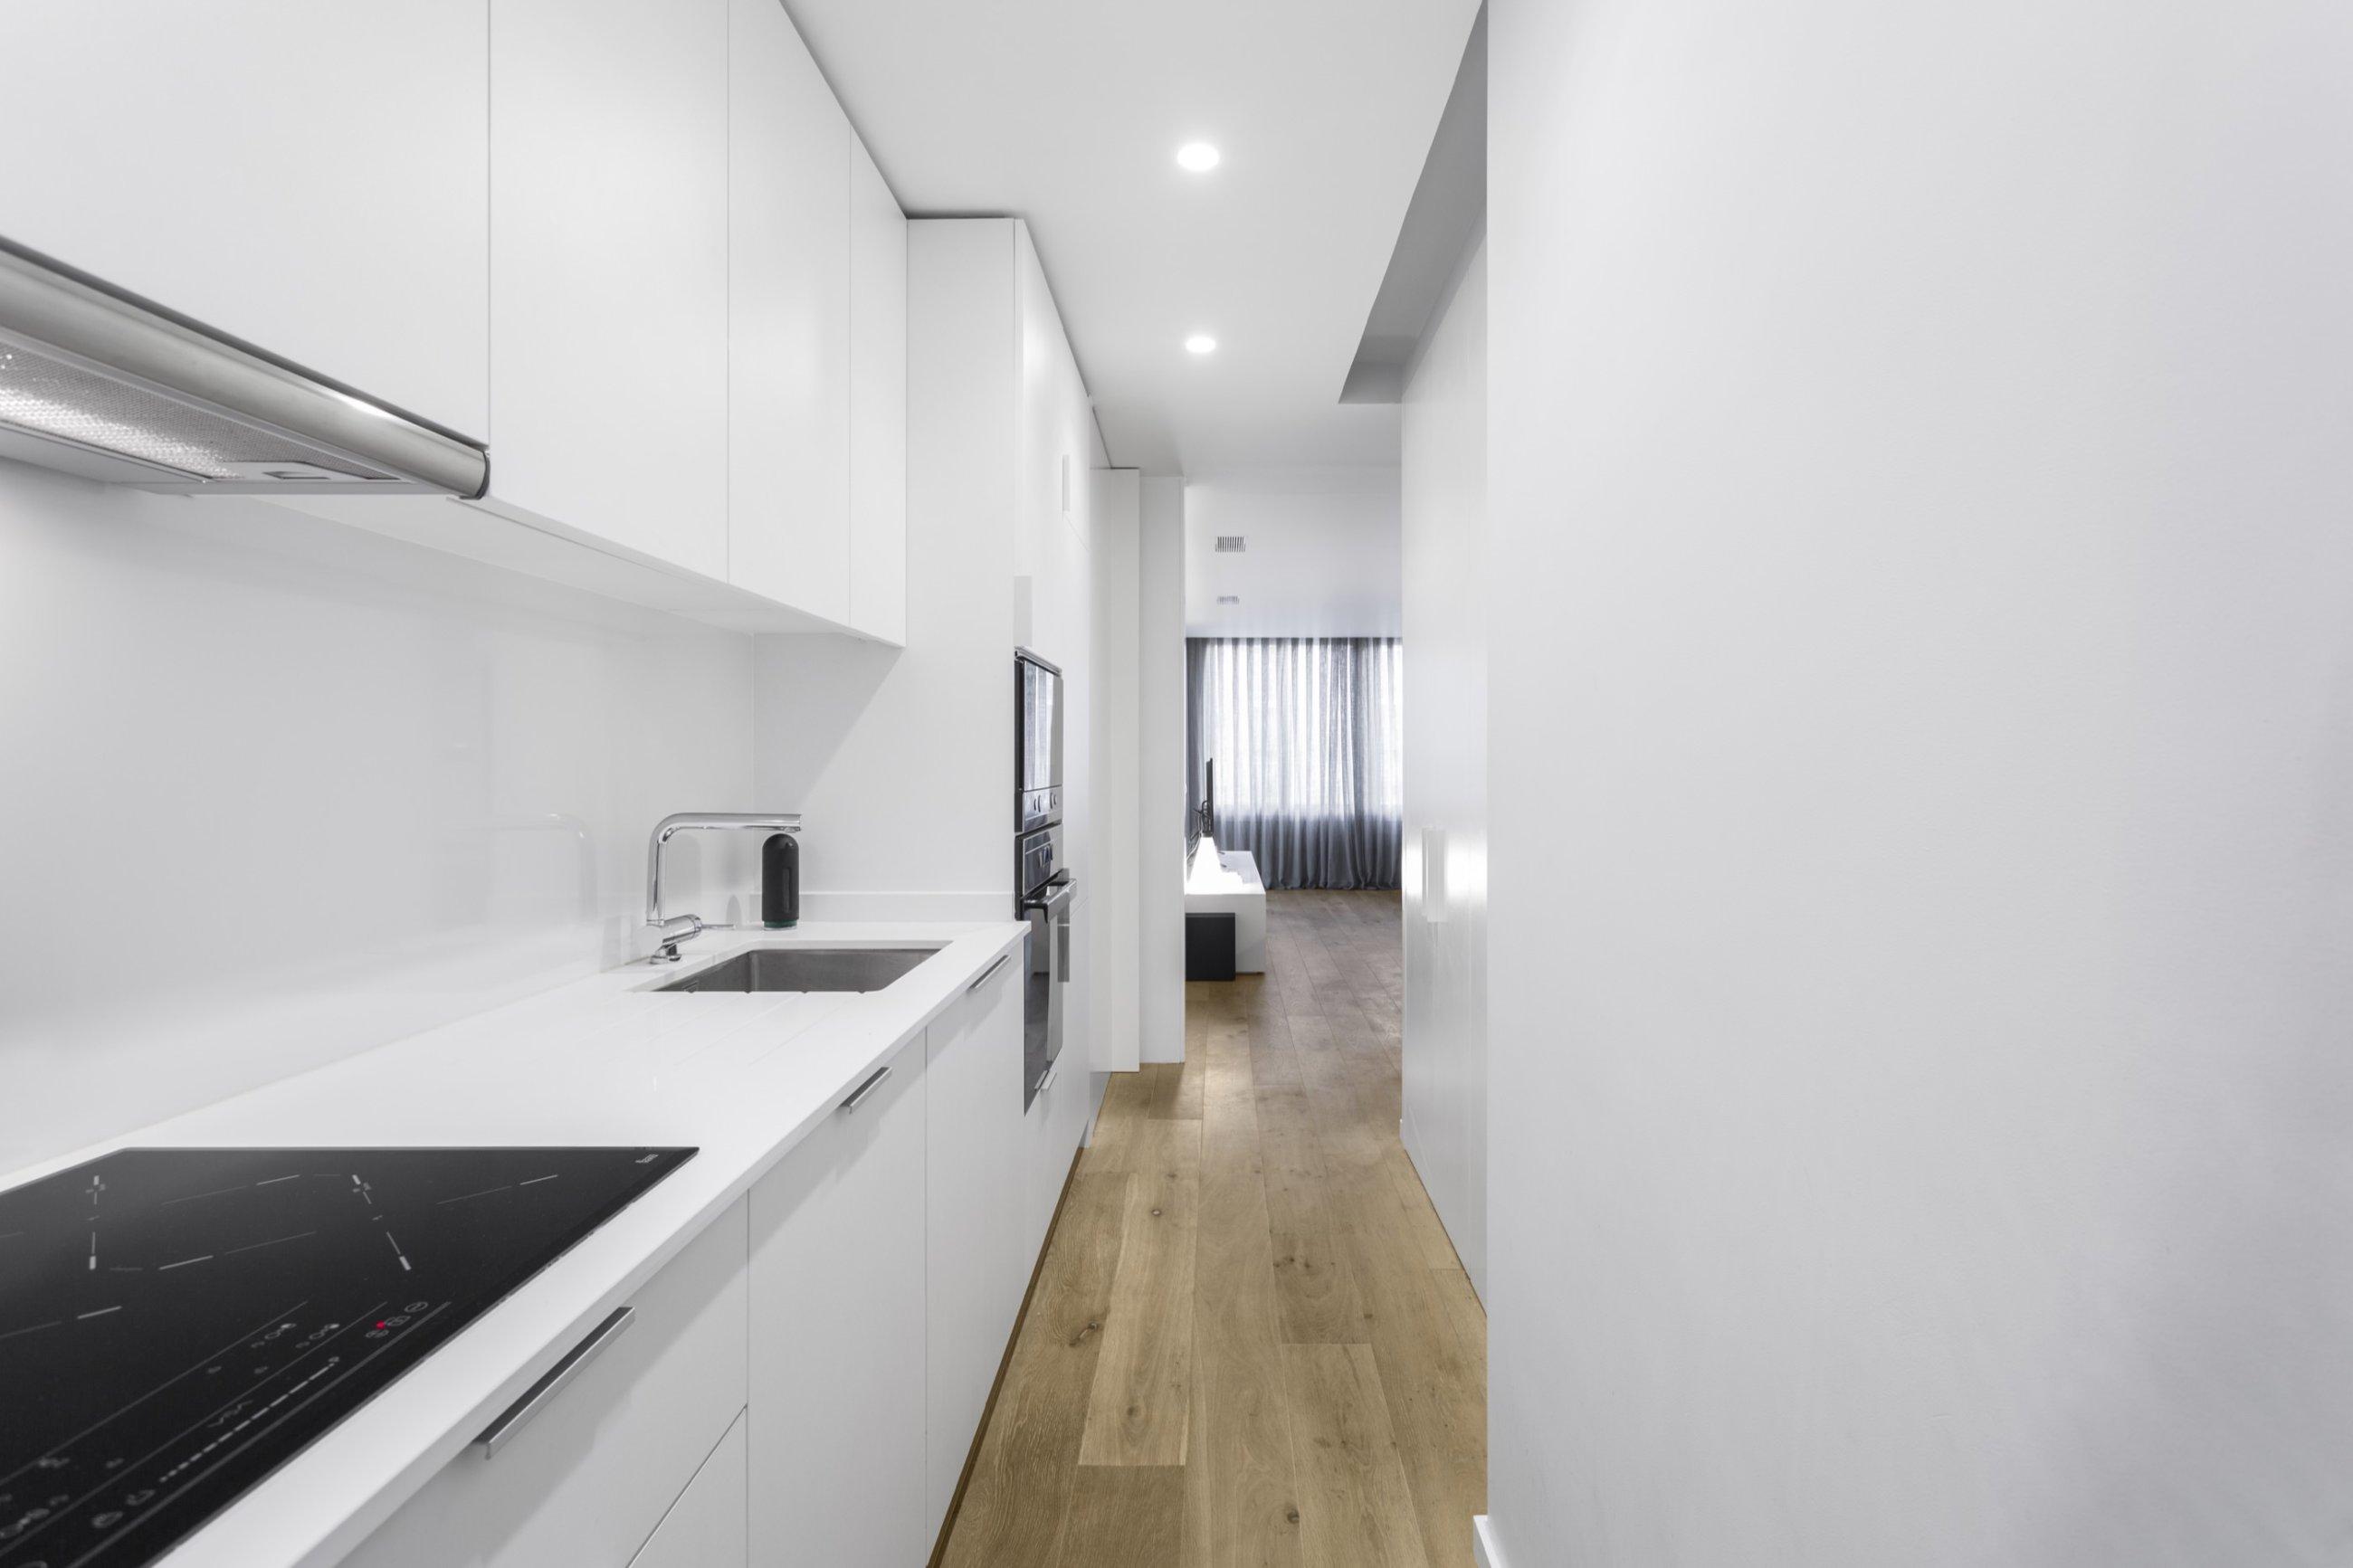 Apartamento Barcelona Arquitecto Paulo Martins 28 do fotografo Ivo Tavares Studio